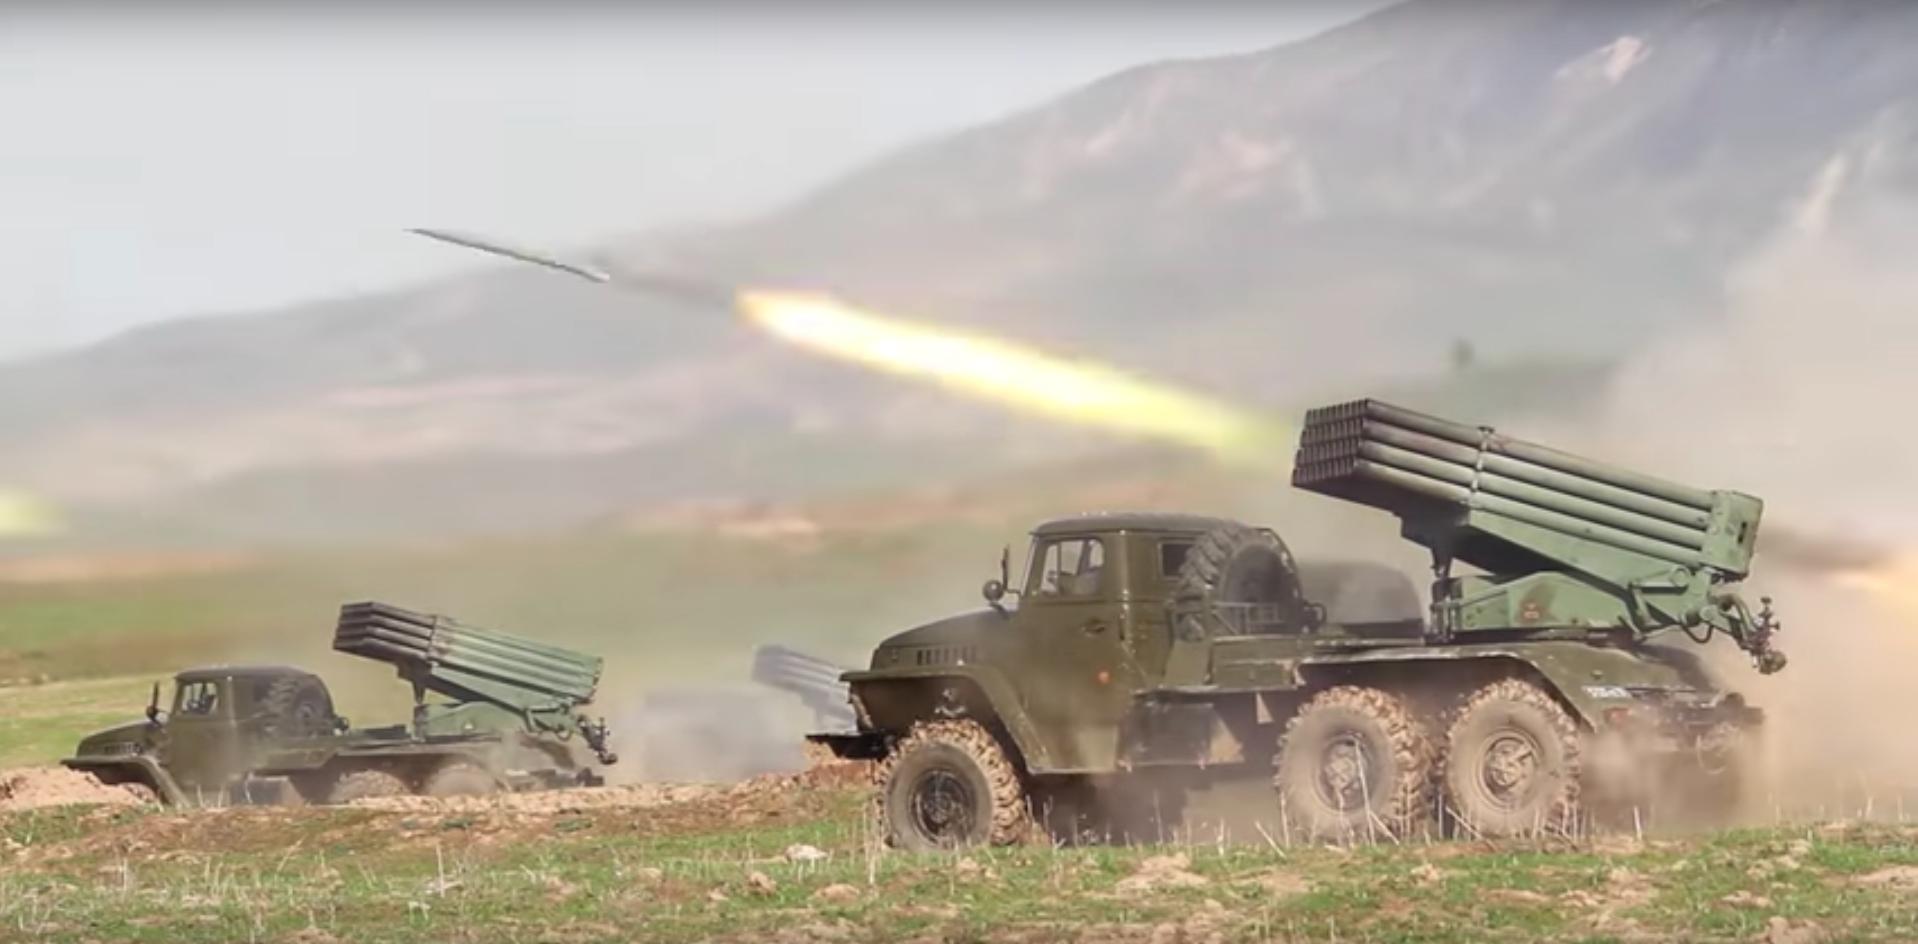 Military drills in Tajikistan expose Kremlin's worry over waning influence